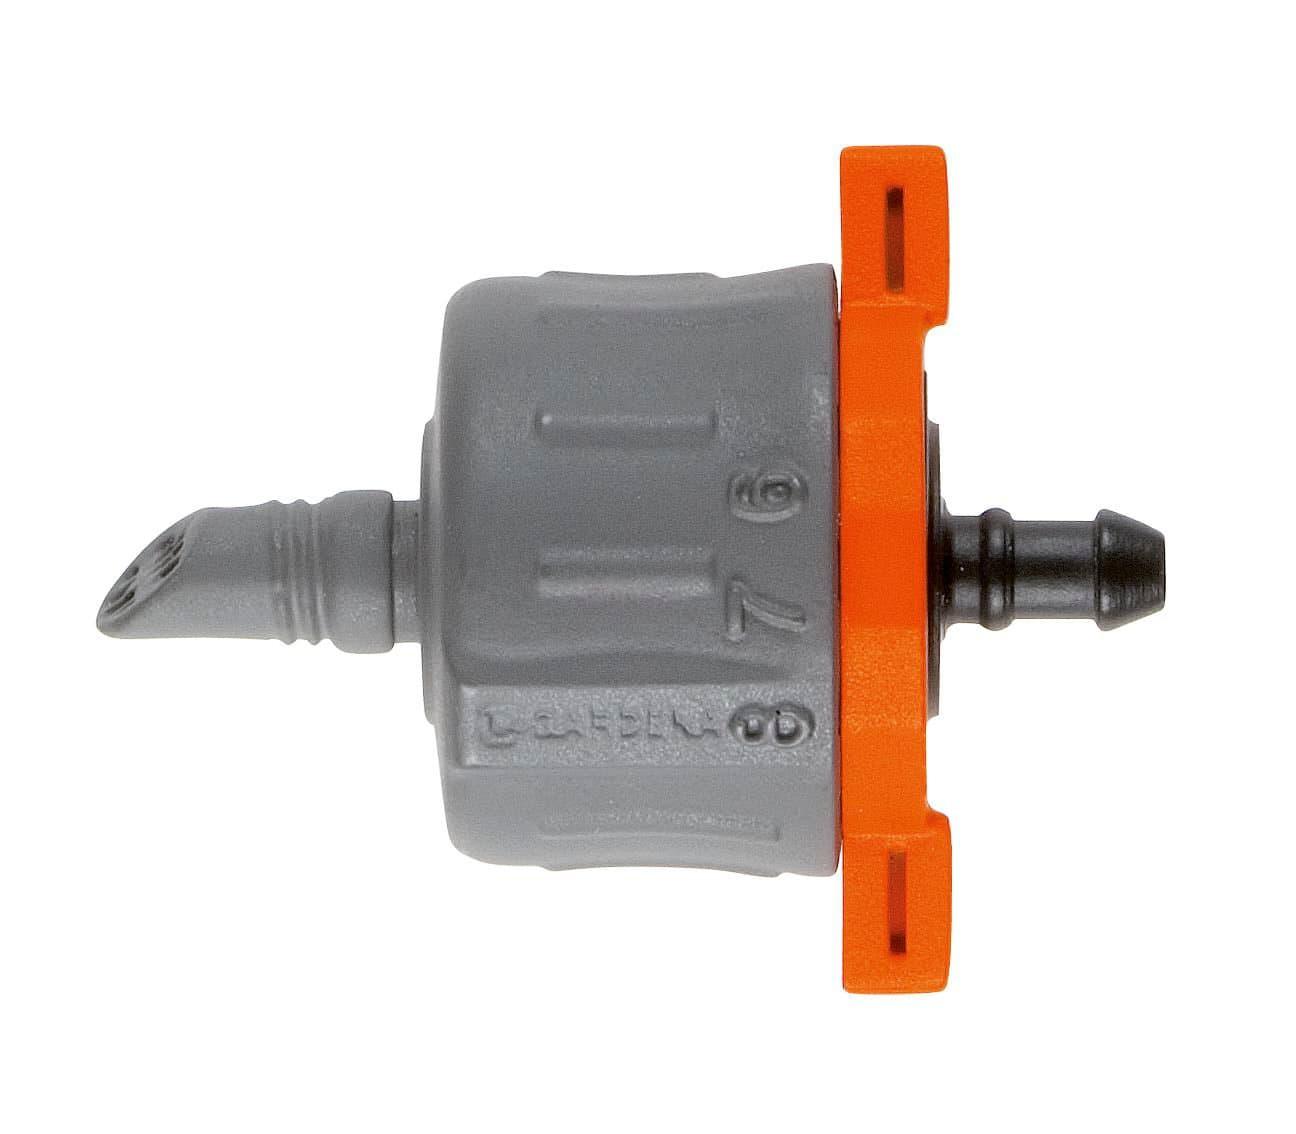 Gardena Micro-Drip-System Gocciolatore